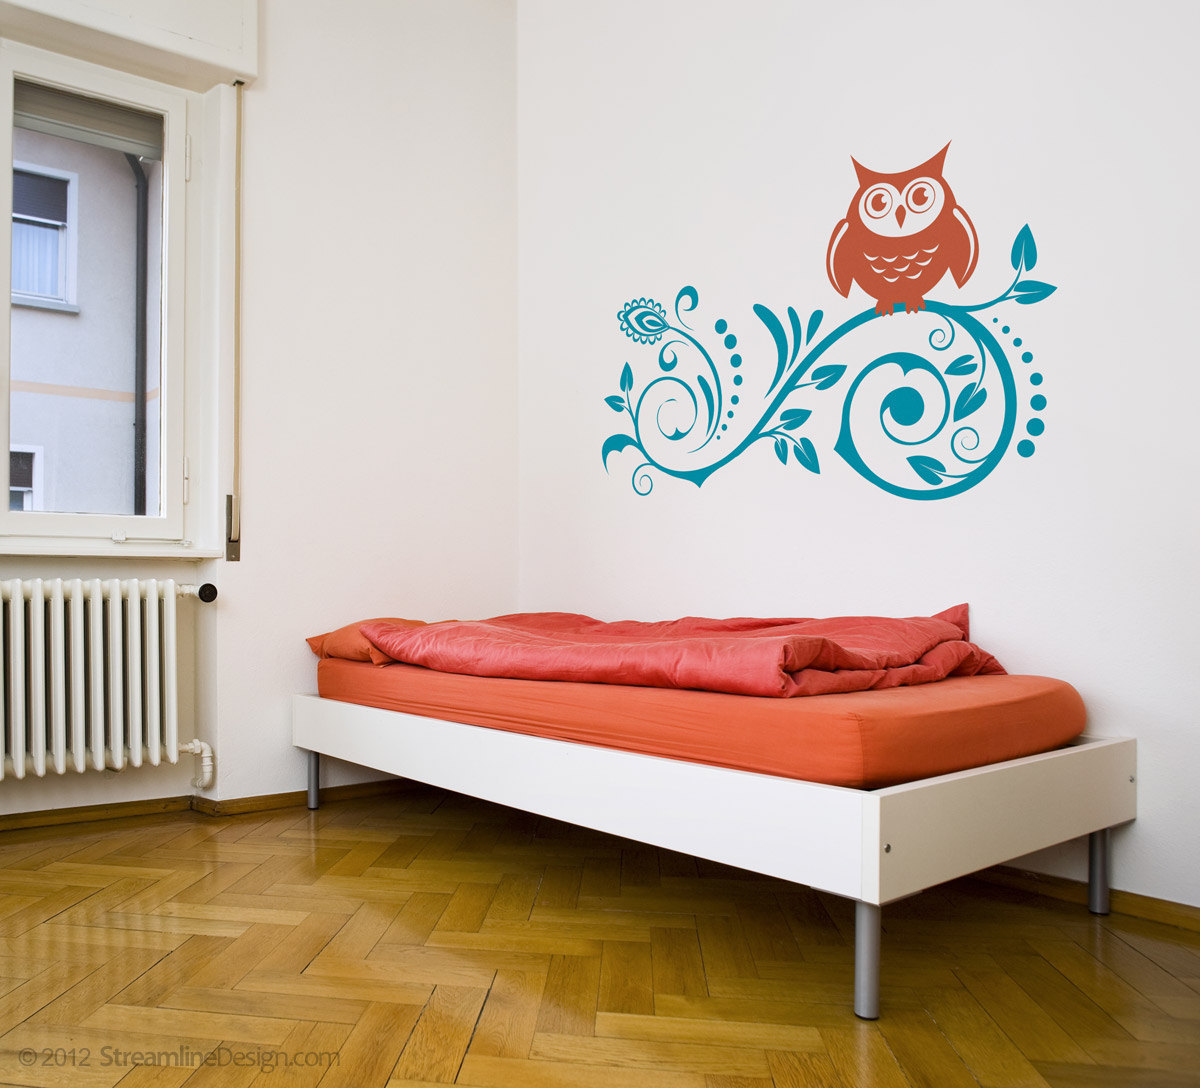 Owl on Floral Scroll Tree Branch.  Decorative Vinyl Wall Art